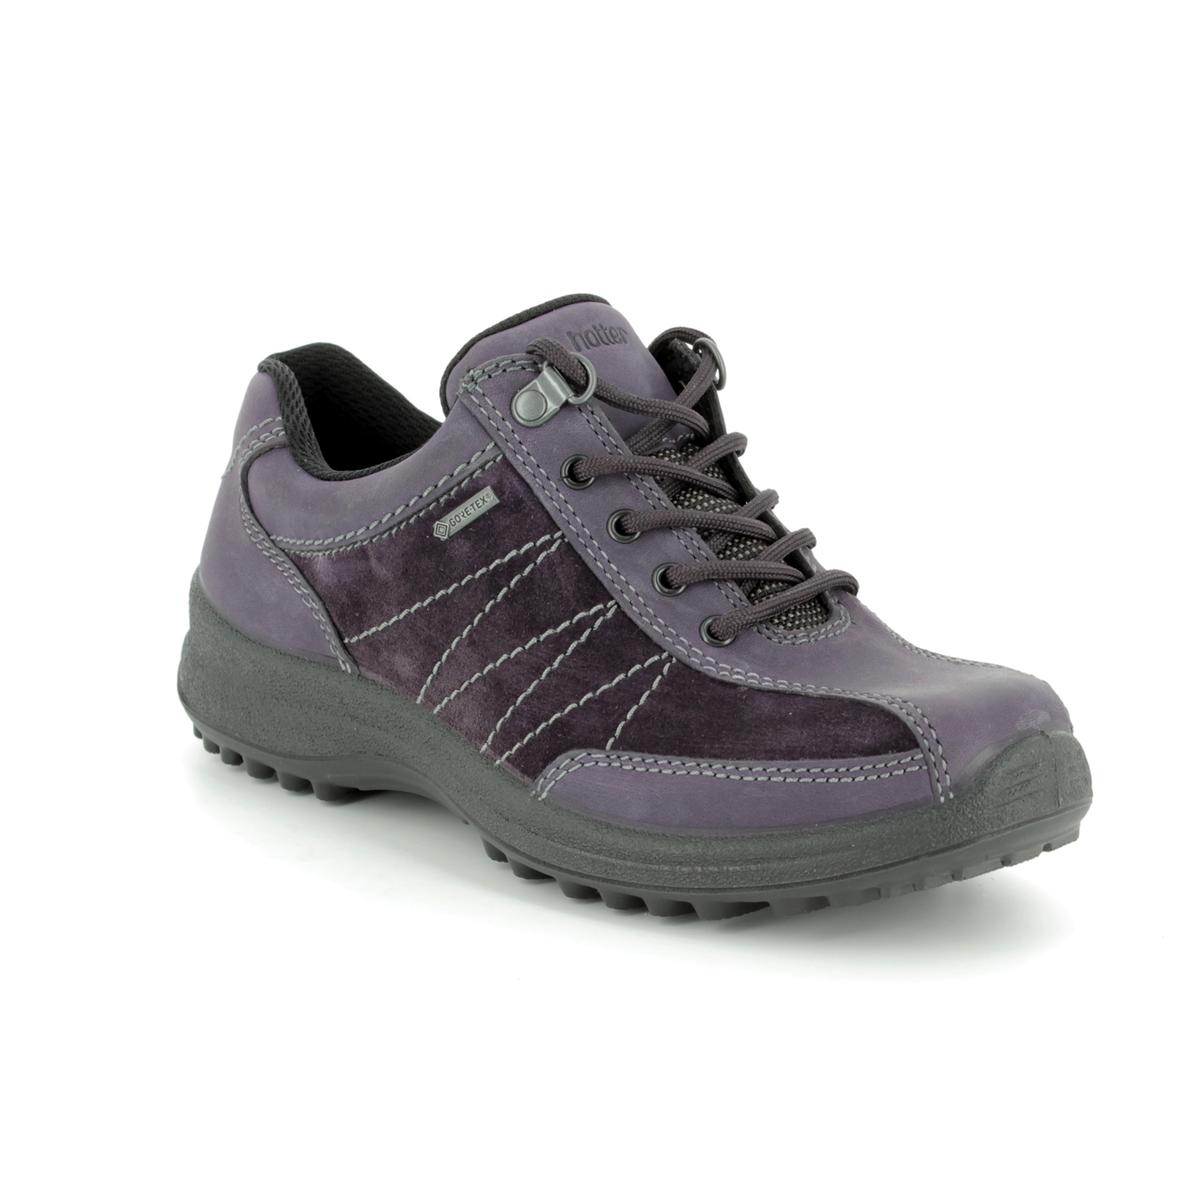 8c8434d9f1a 8113/95 Mist Gore-tex E Fit at Begg Shoes & Bags